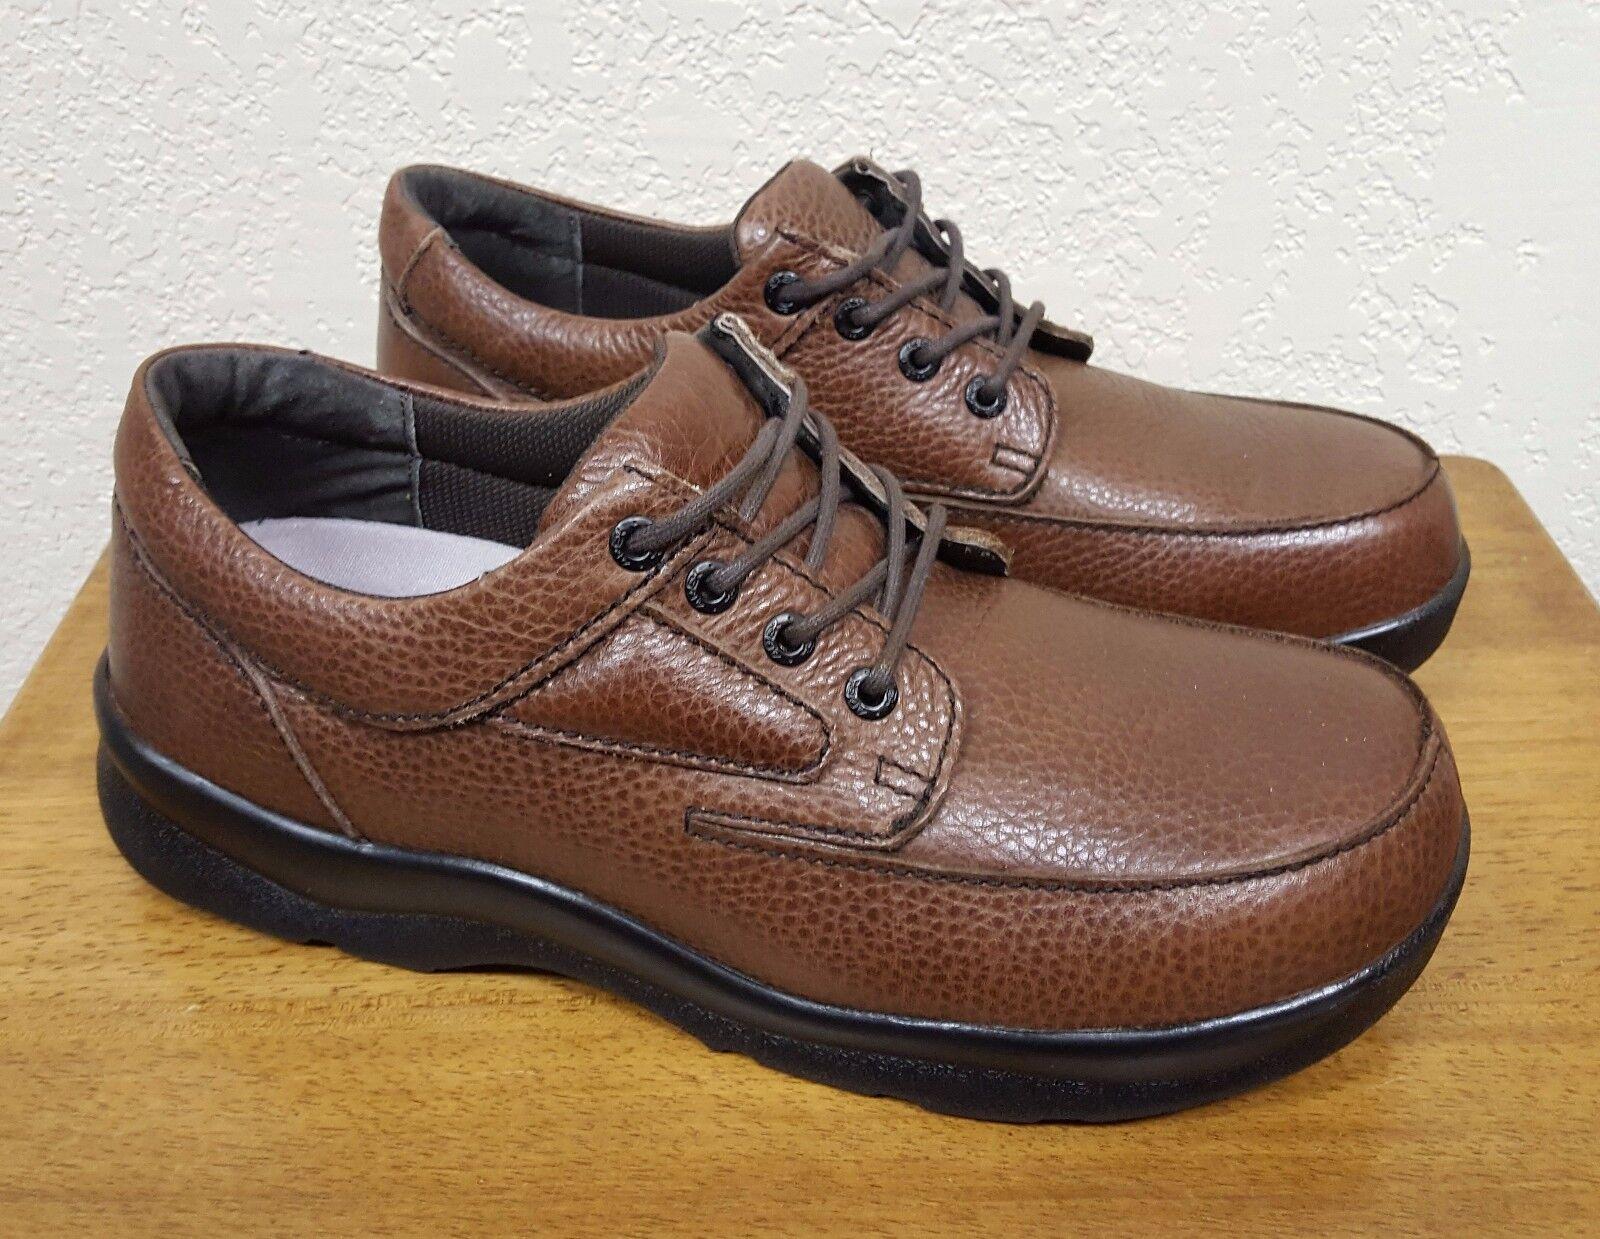 Men's Aetrex Apex shoes Y910M Casual Walker - Comfort Therapeutic Diabetic 13W